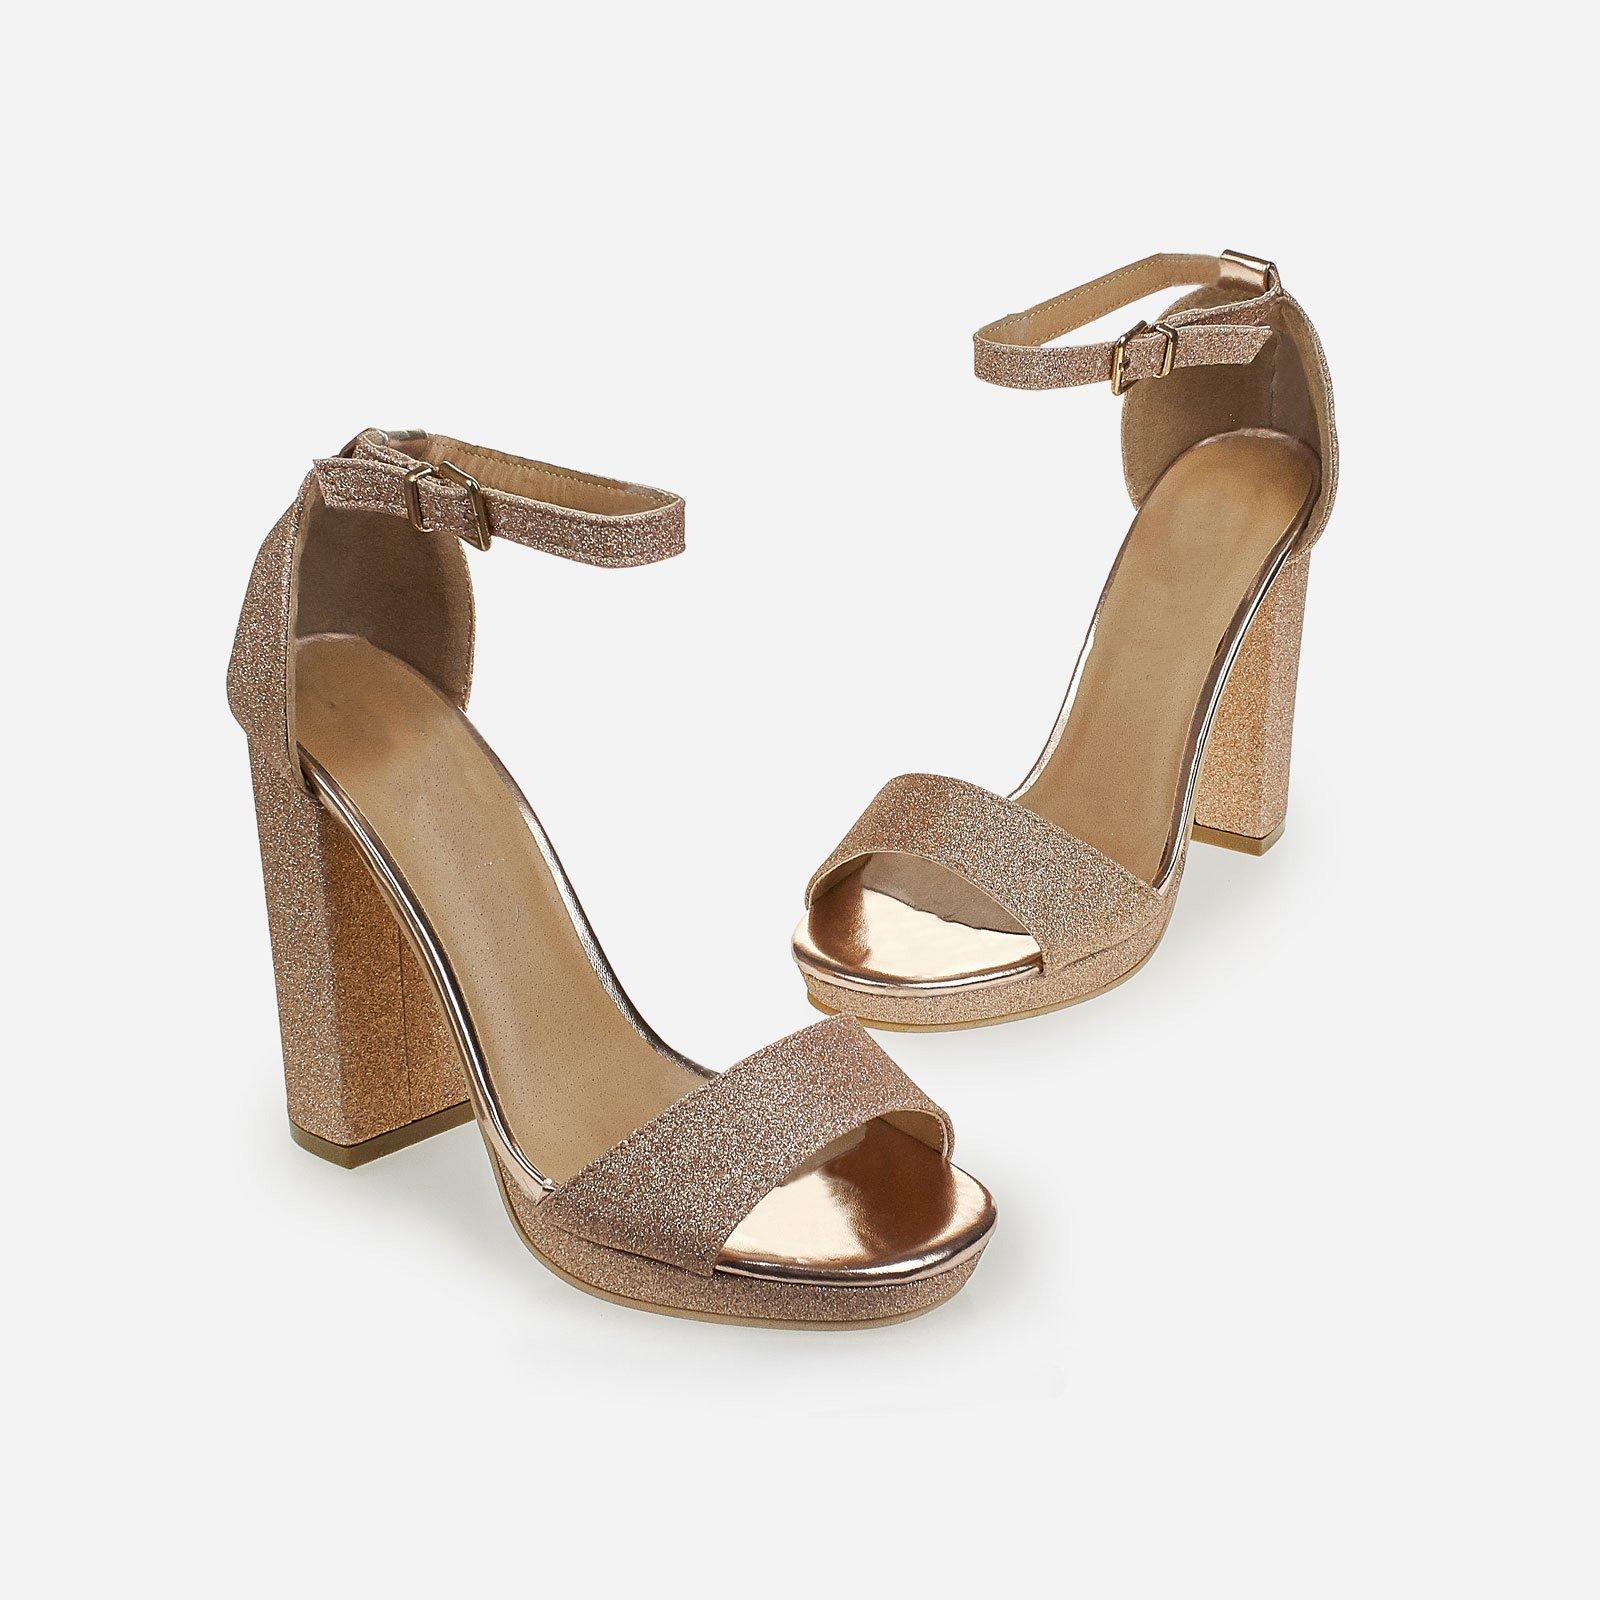 Chloe Block Heeled Sandal In Rose Gold Glitter